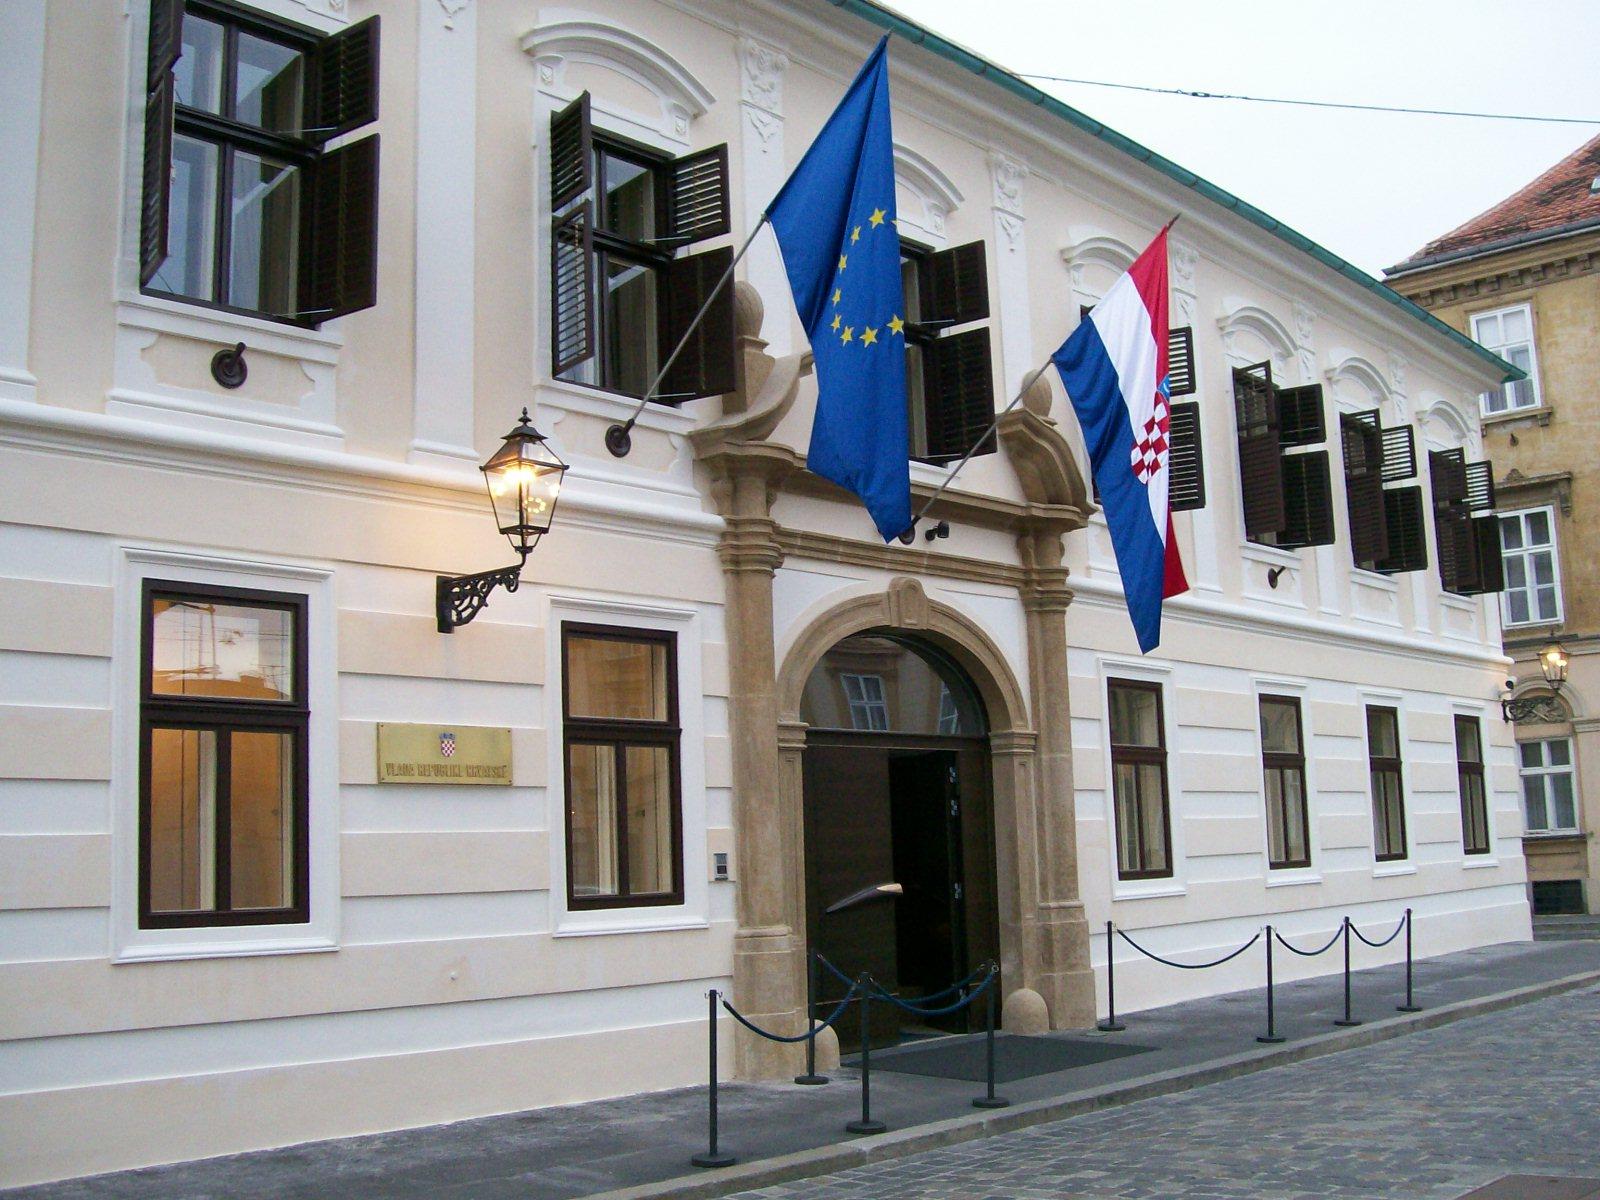 Zagreb - Opća tura: Banski dvori